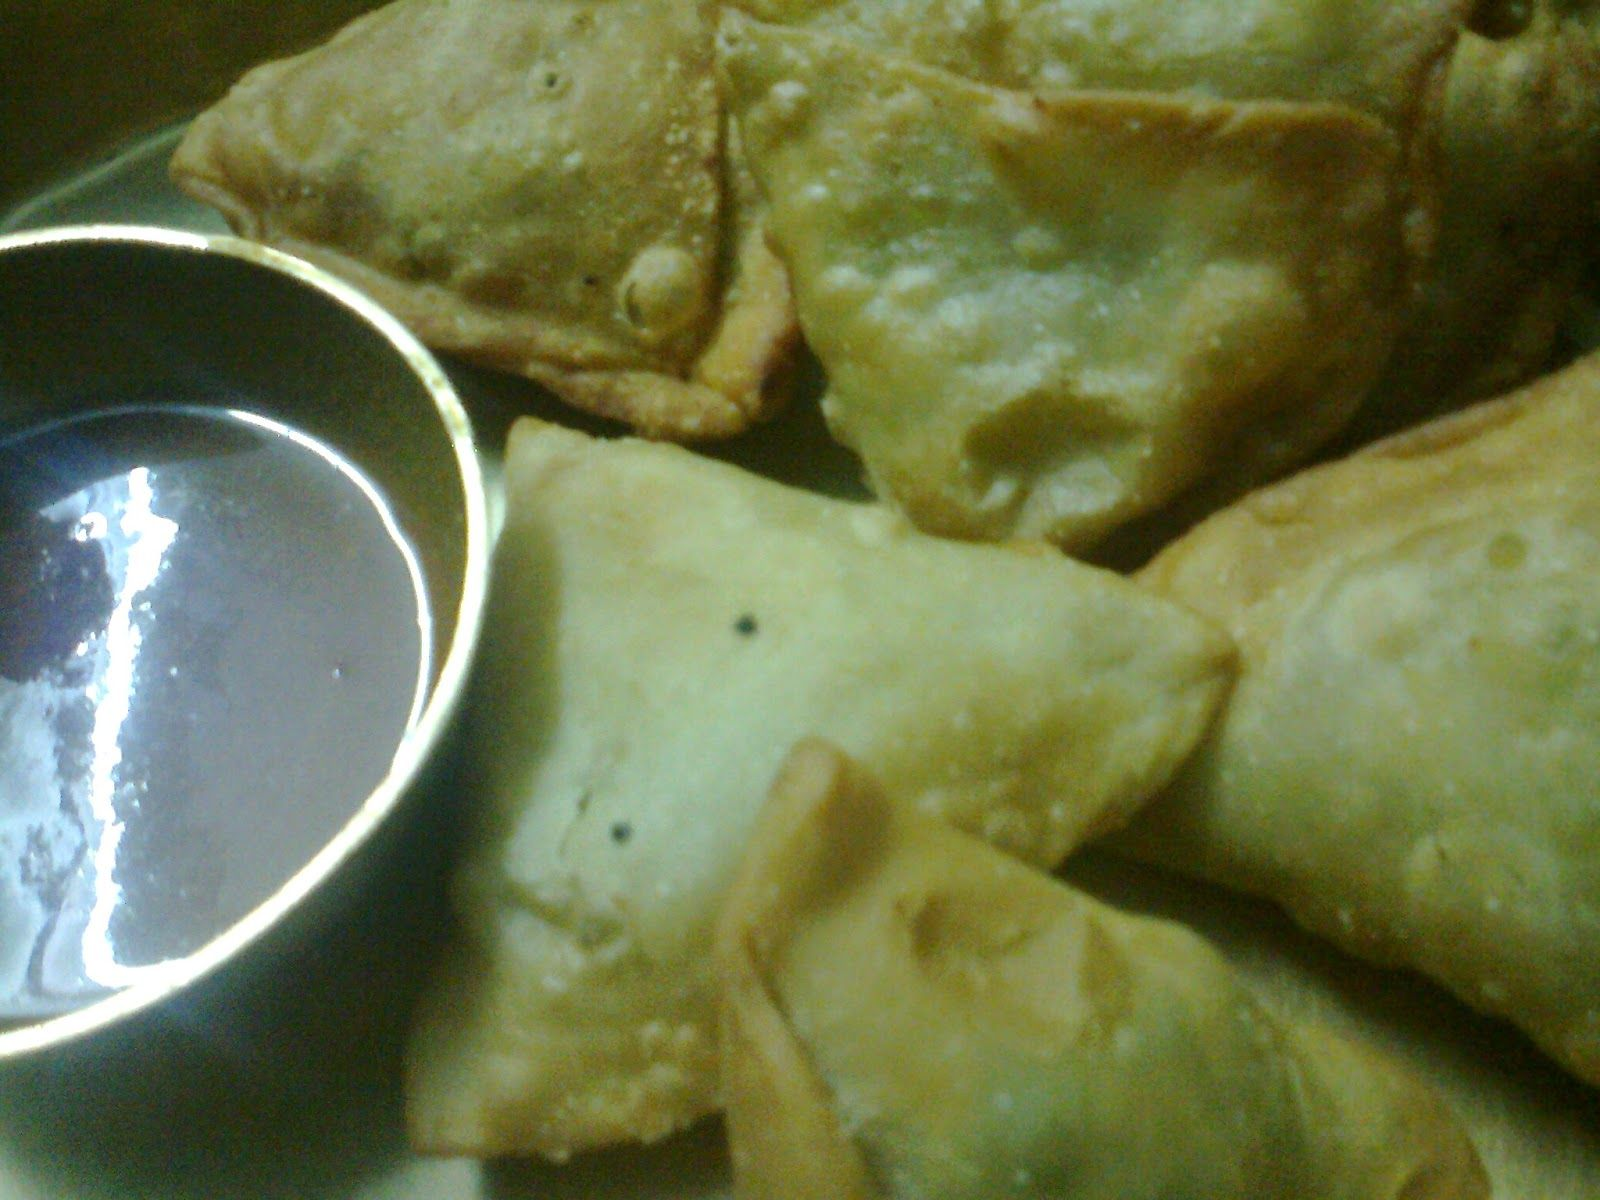 Lilva na samosa recipe in gujarati language recipes in gujarati lilva na samosa recipe in gujarati language forumfinder Images